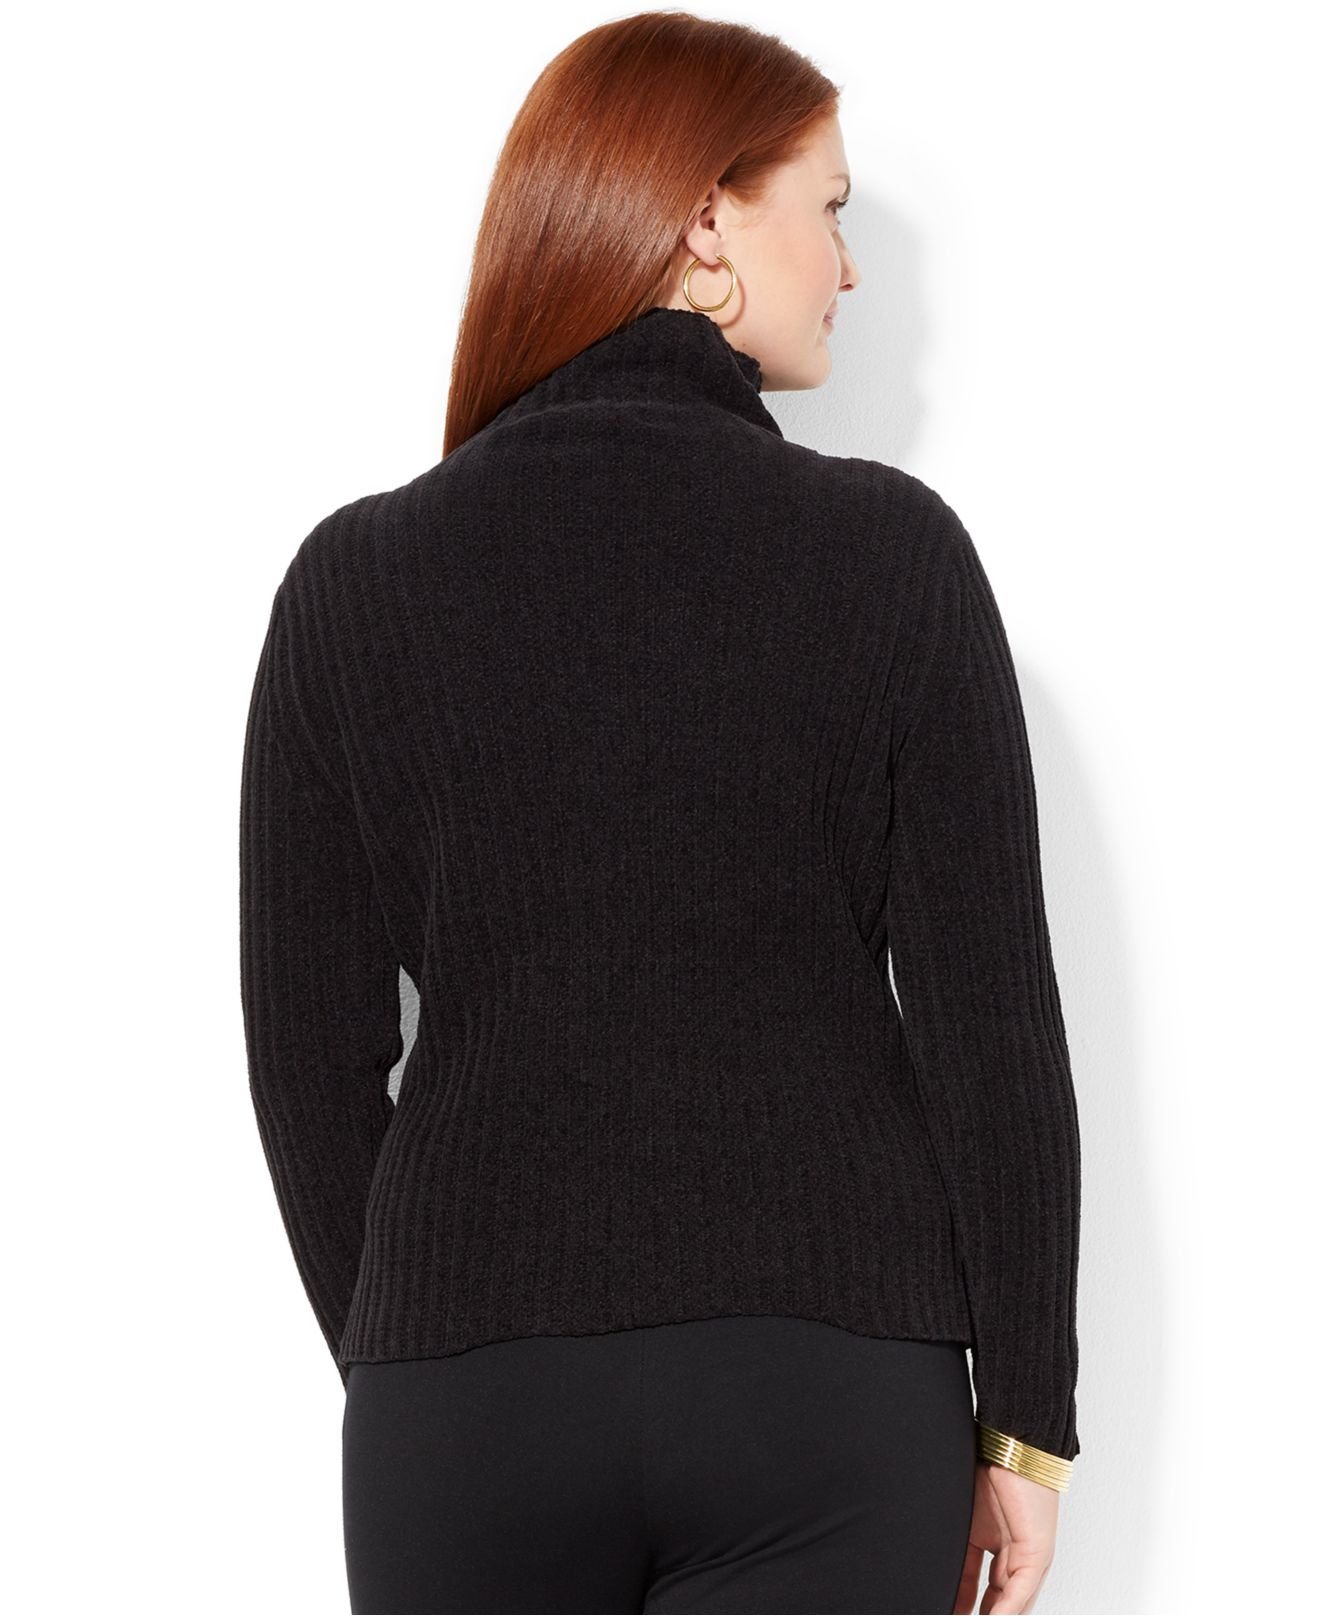 Ribbed Sweater: Lauren By Ralph Lauren Plus Size Ribbed Turtleneck